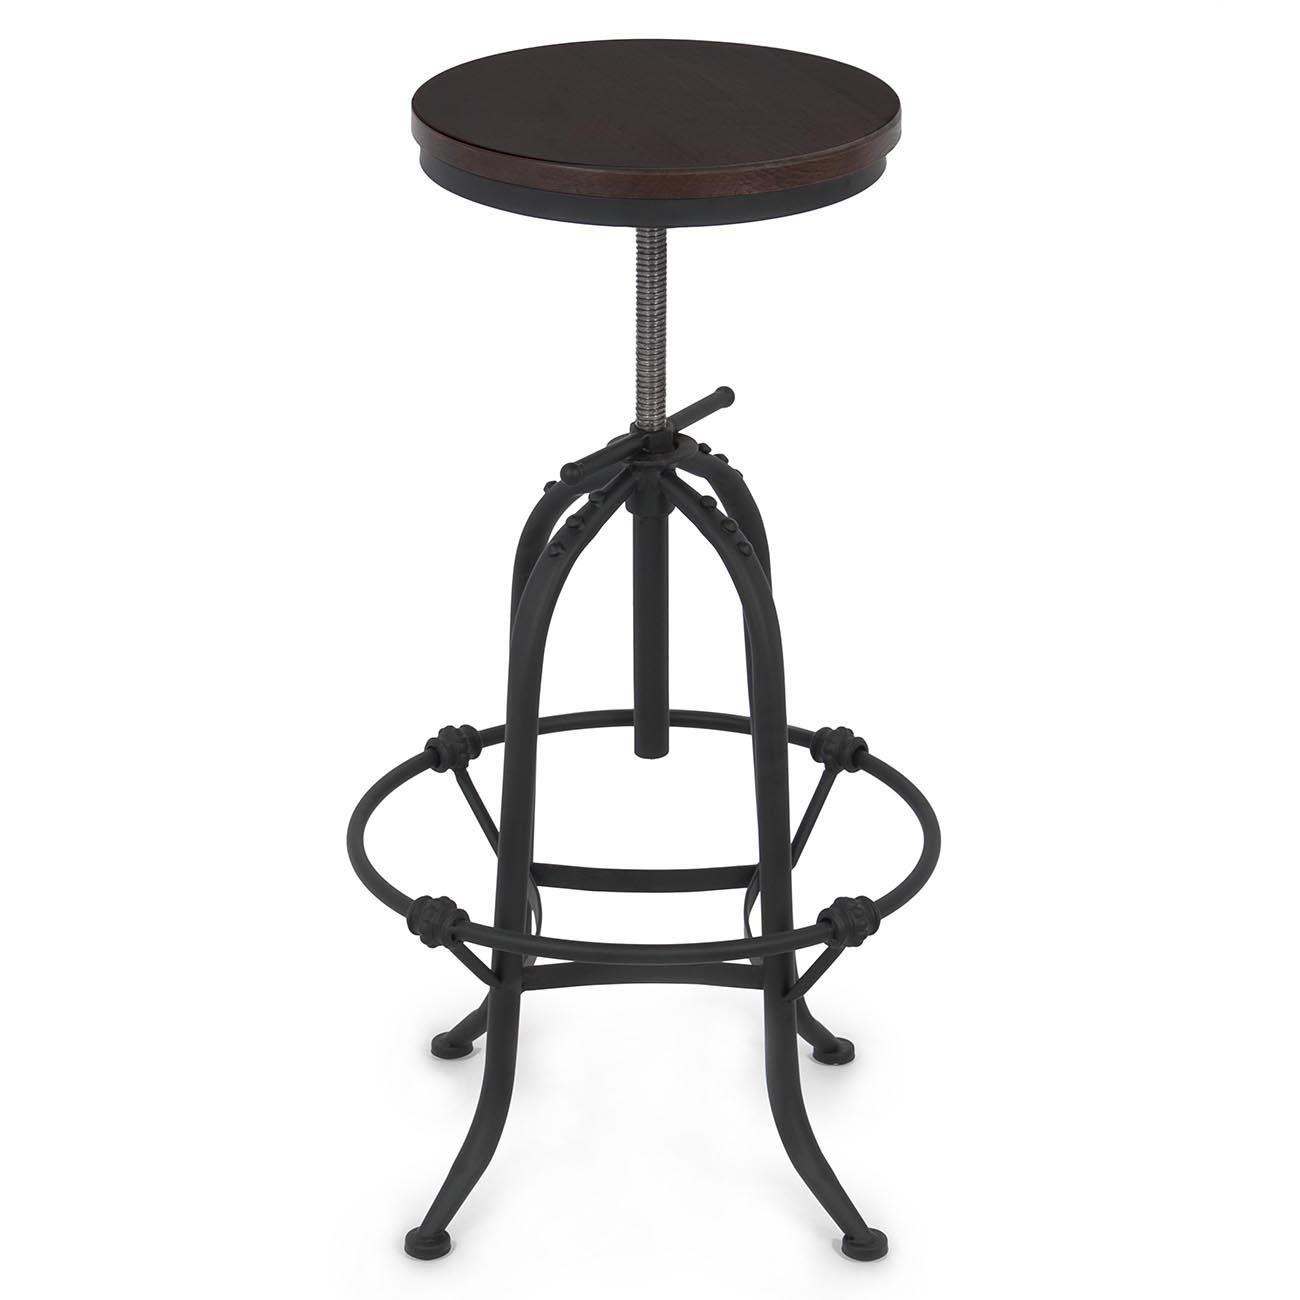 Wood Seat Bar Stool Part - 42: Amazon.com: Belleze Vintage Bar Stool Industrial Rustic Style Wood Seat  Adjustable Height Swivel Top: Kitchen U0026 Dining